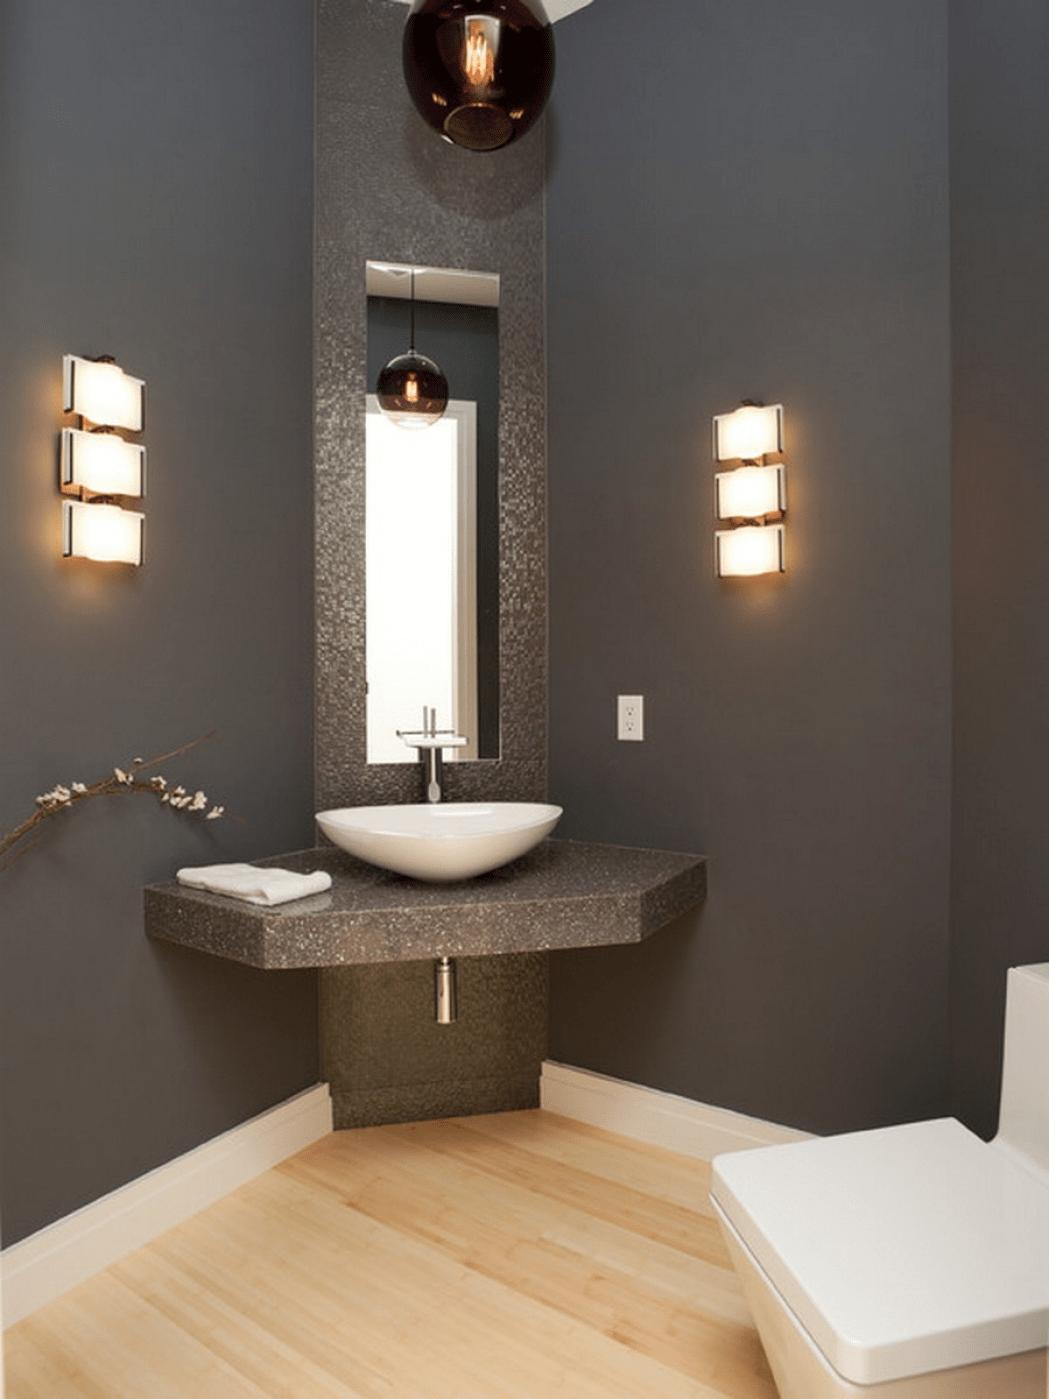 Small bathroom corner sink